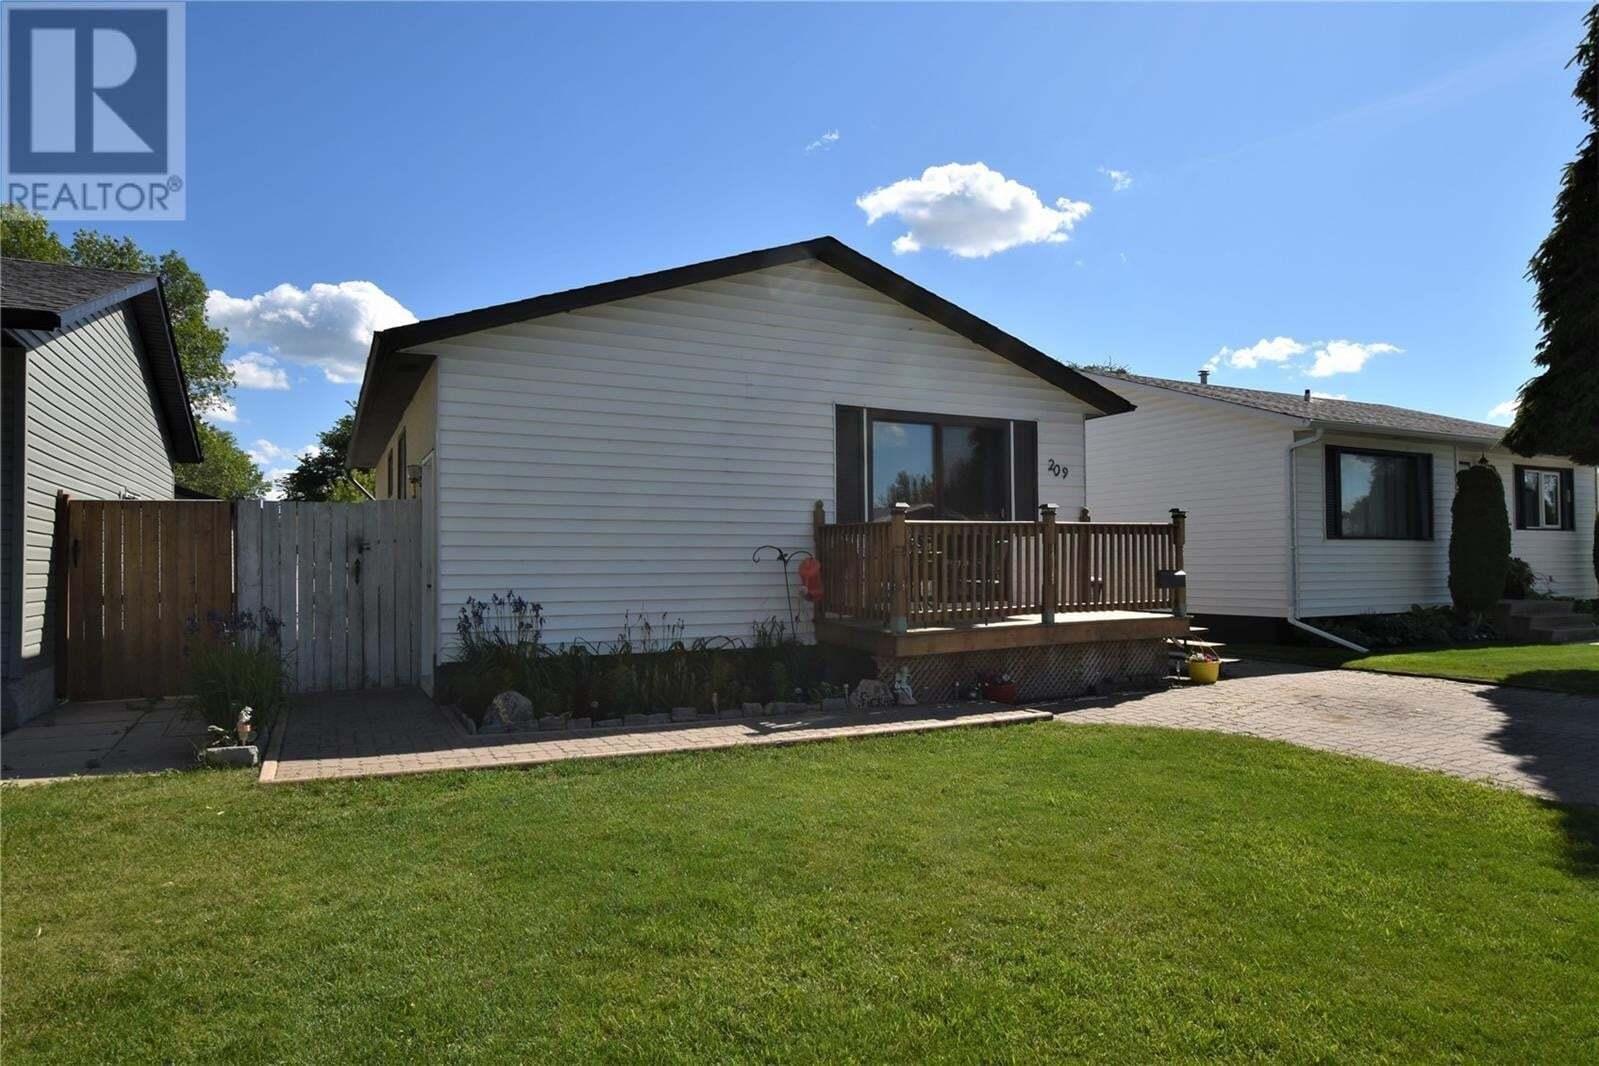 House for sale at 209 Cartier Cres Saskatoon Saskatchewan - MLS: SK814101